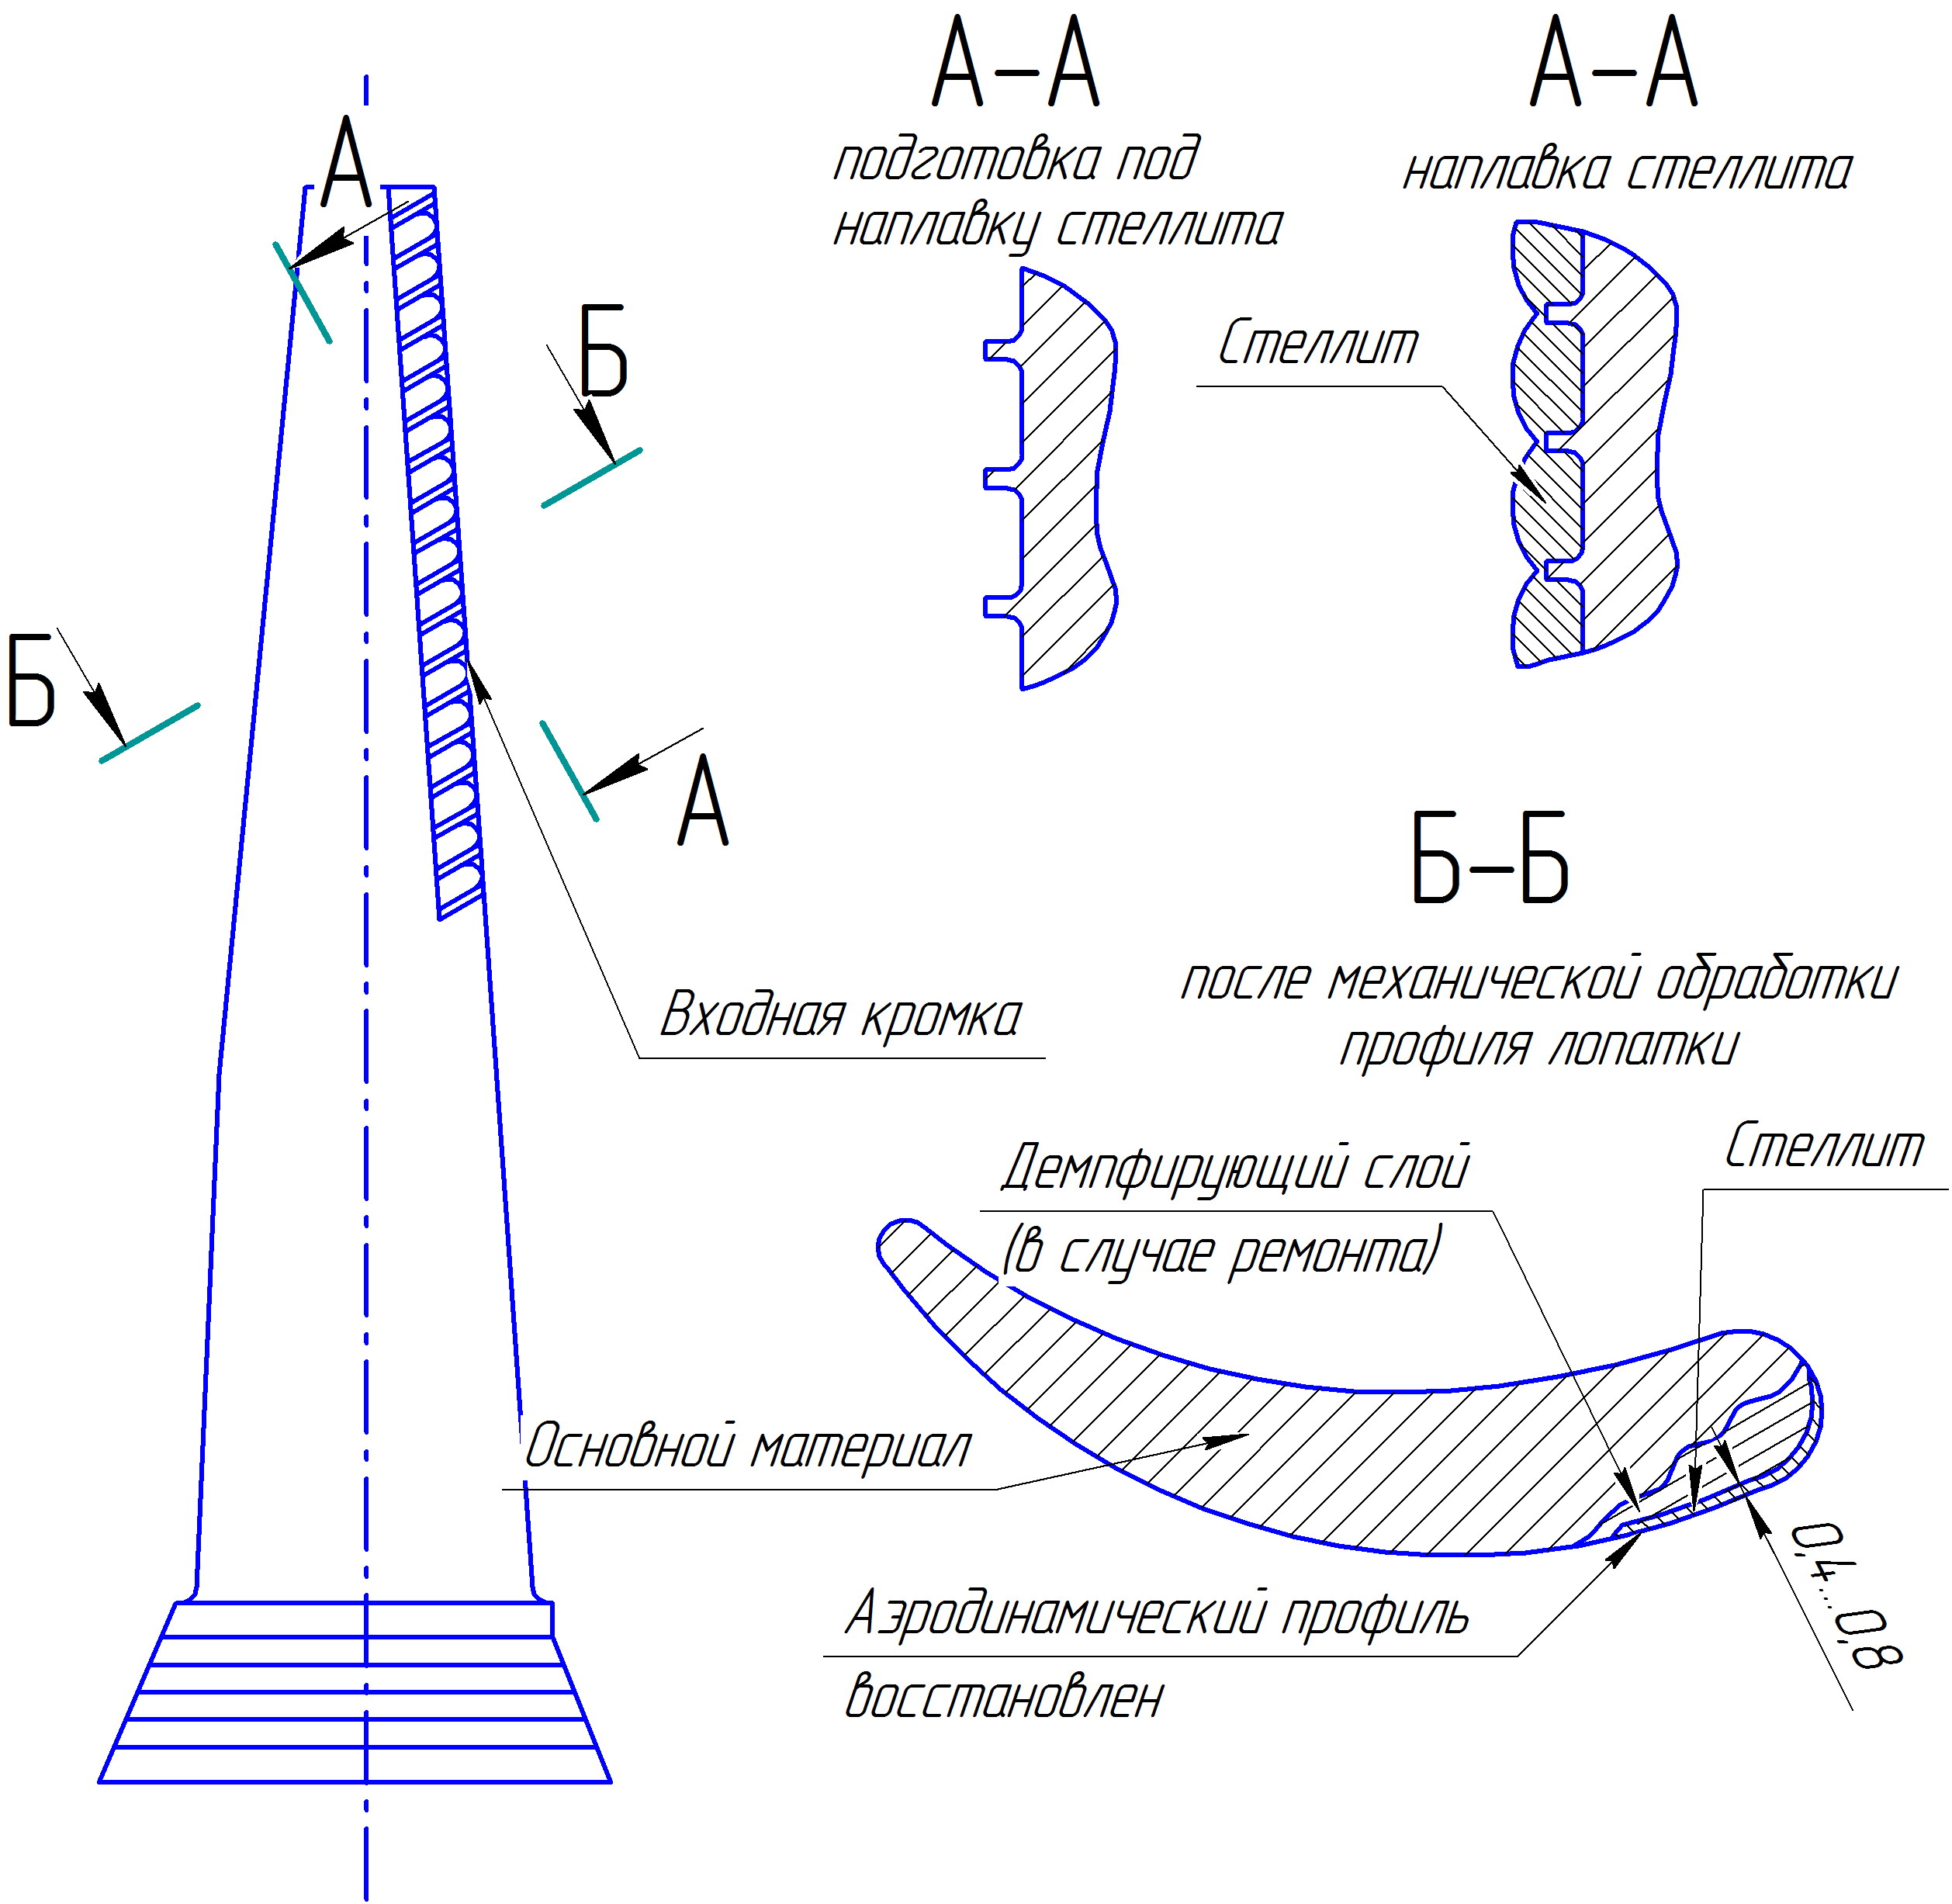 Repair of steam turbine blades